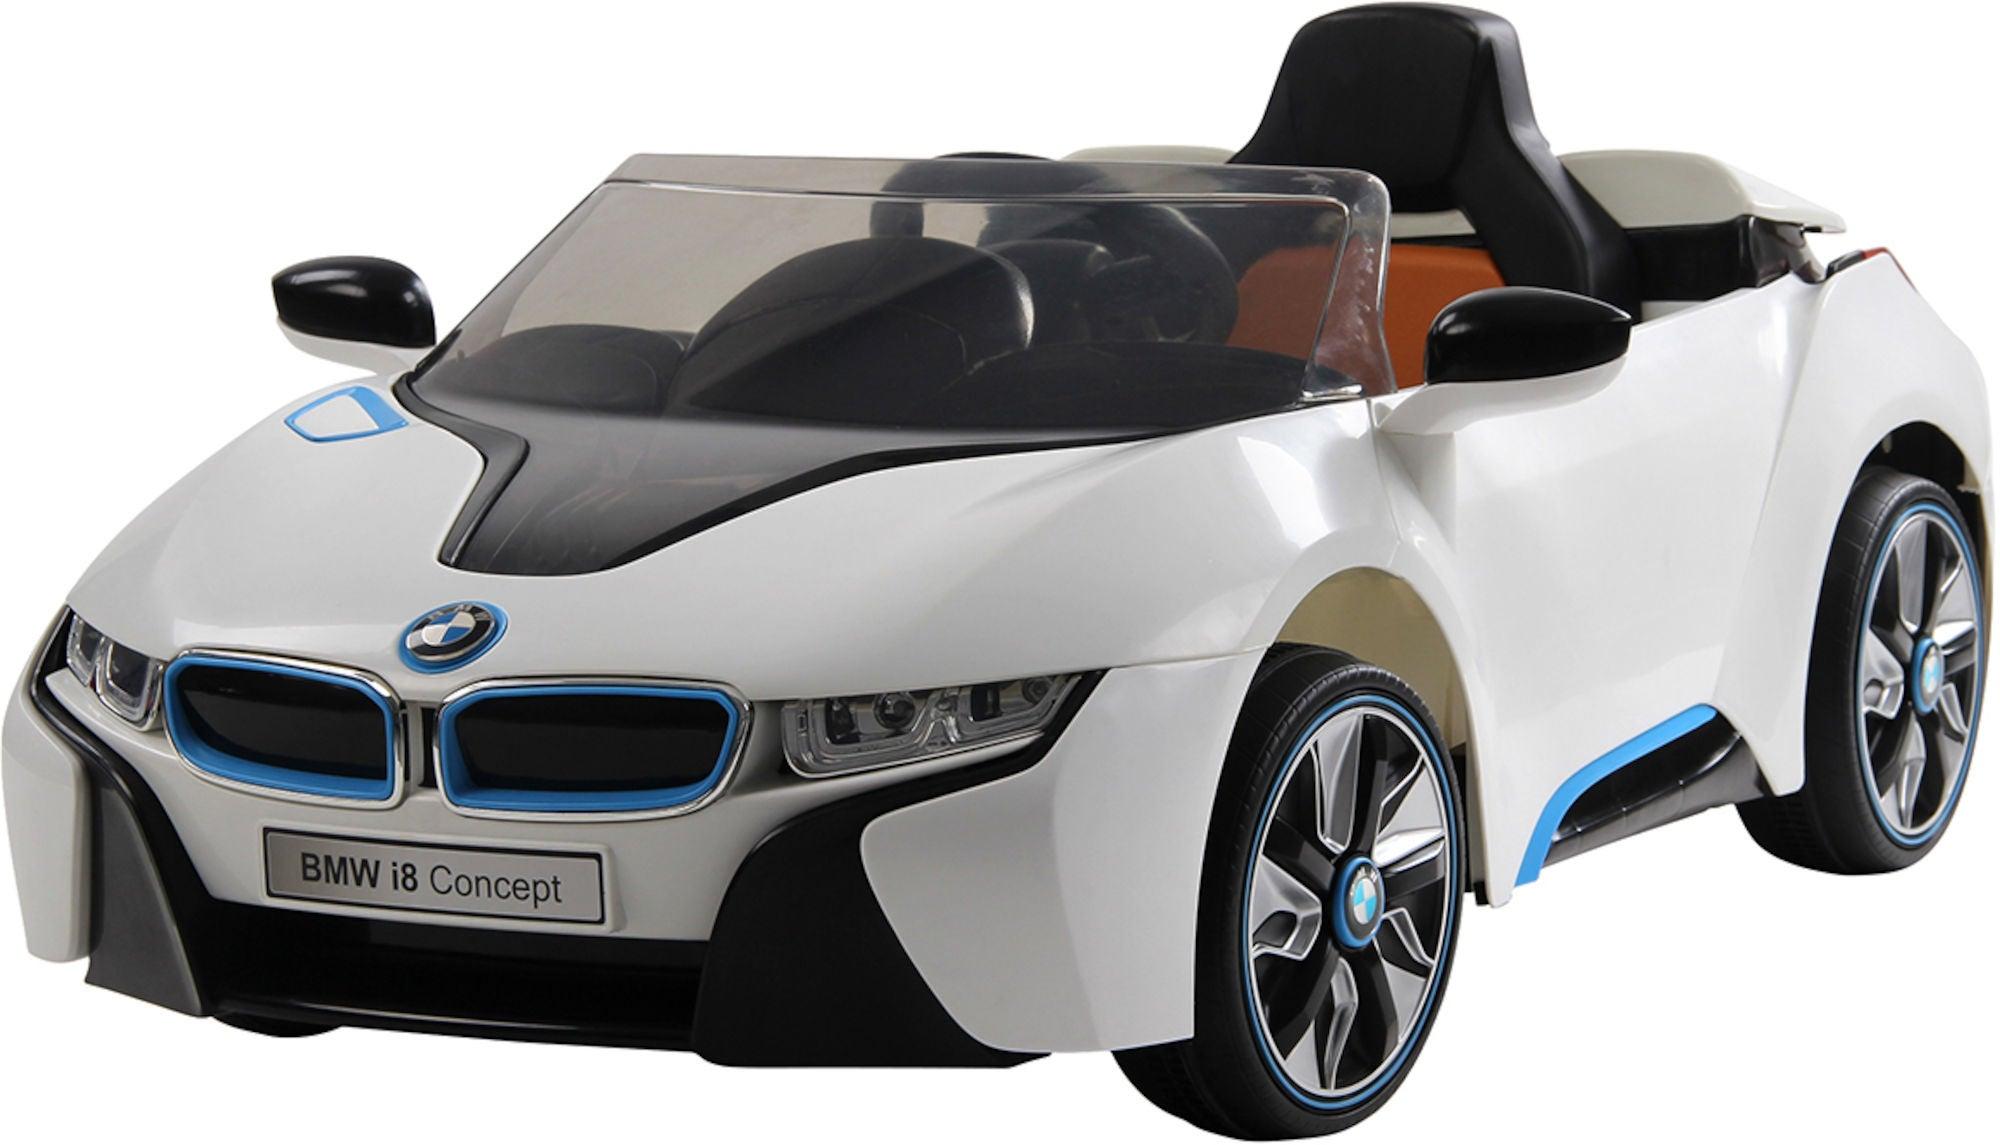 BMW i8 Elbil, Vit